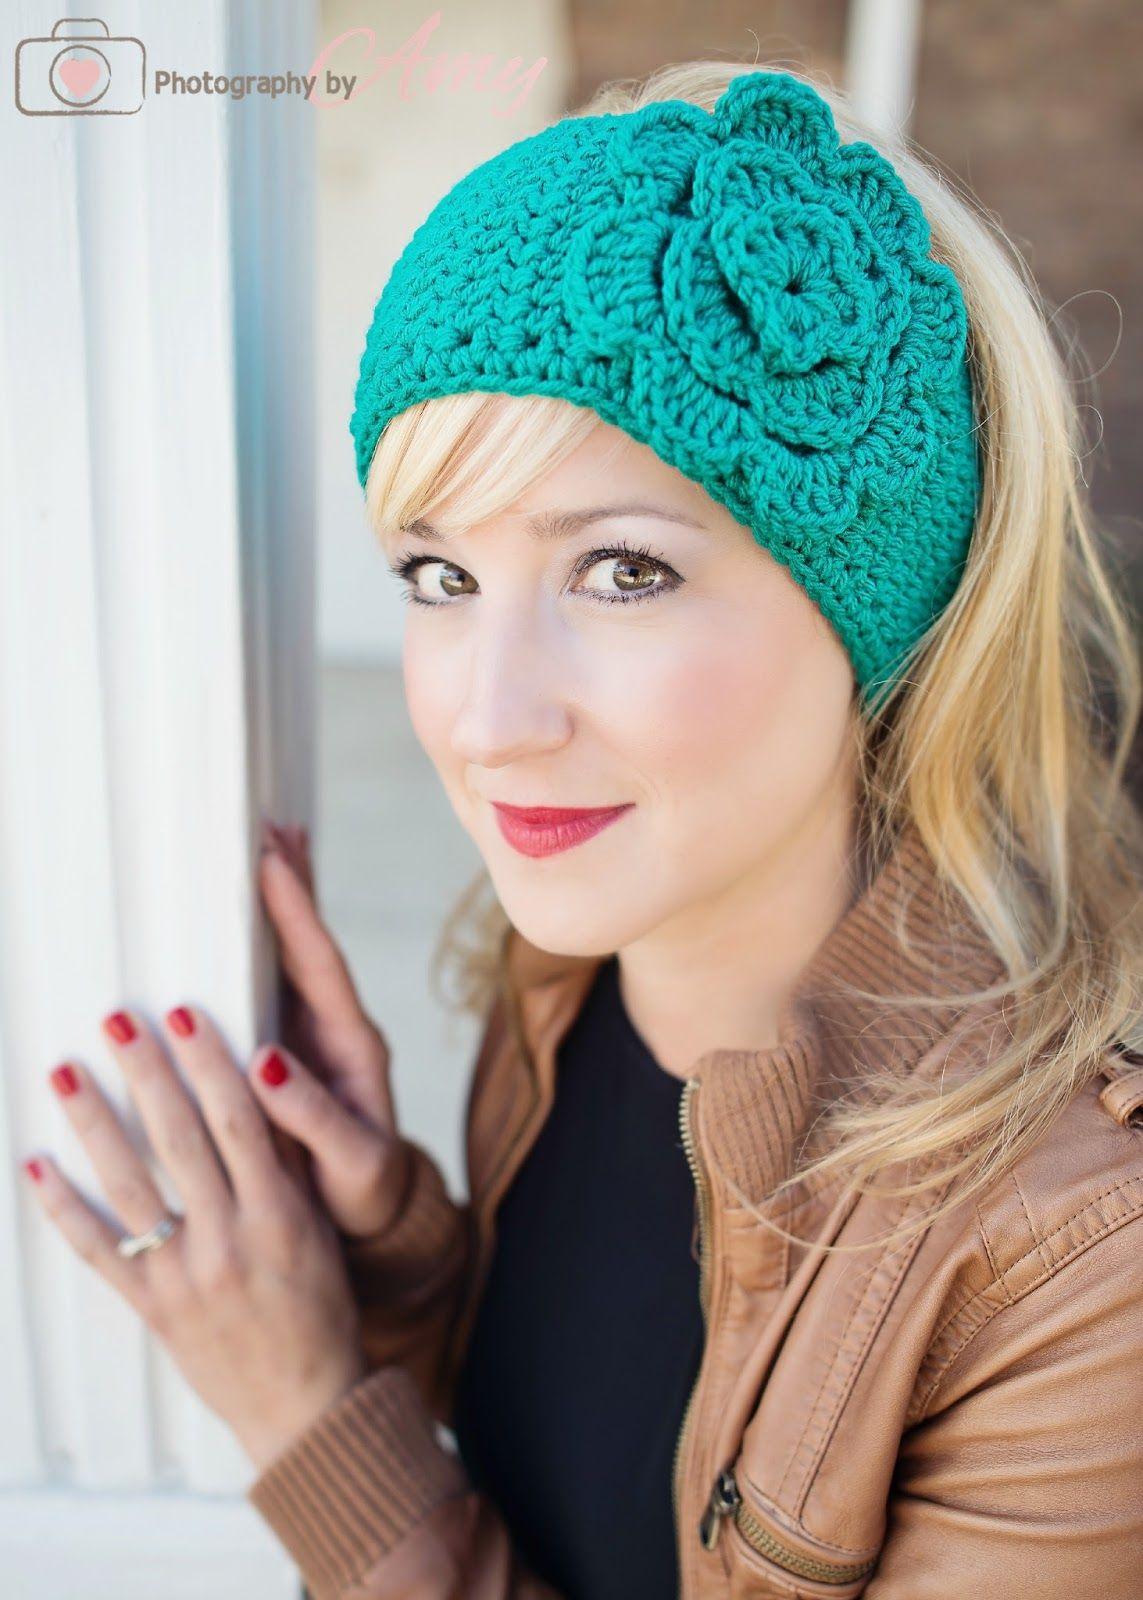 Hopeful Honey | Craft, Crochet, Create: 10 Free Beautiful Boho ...